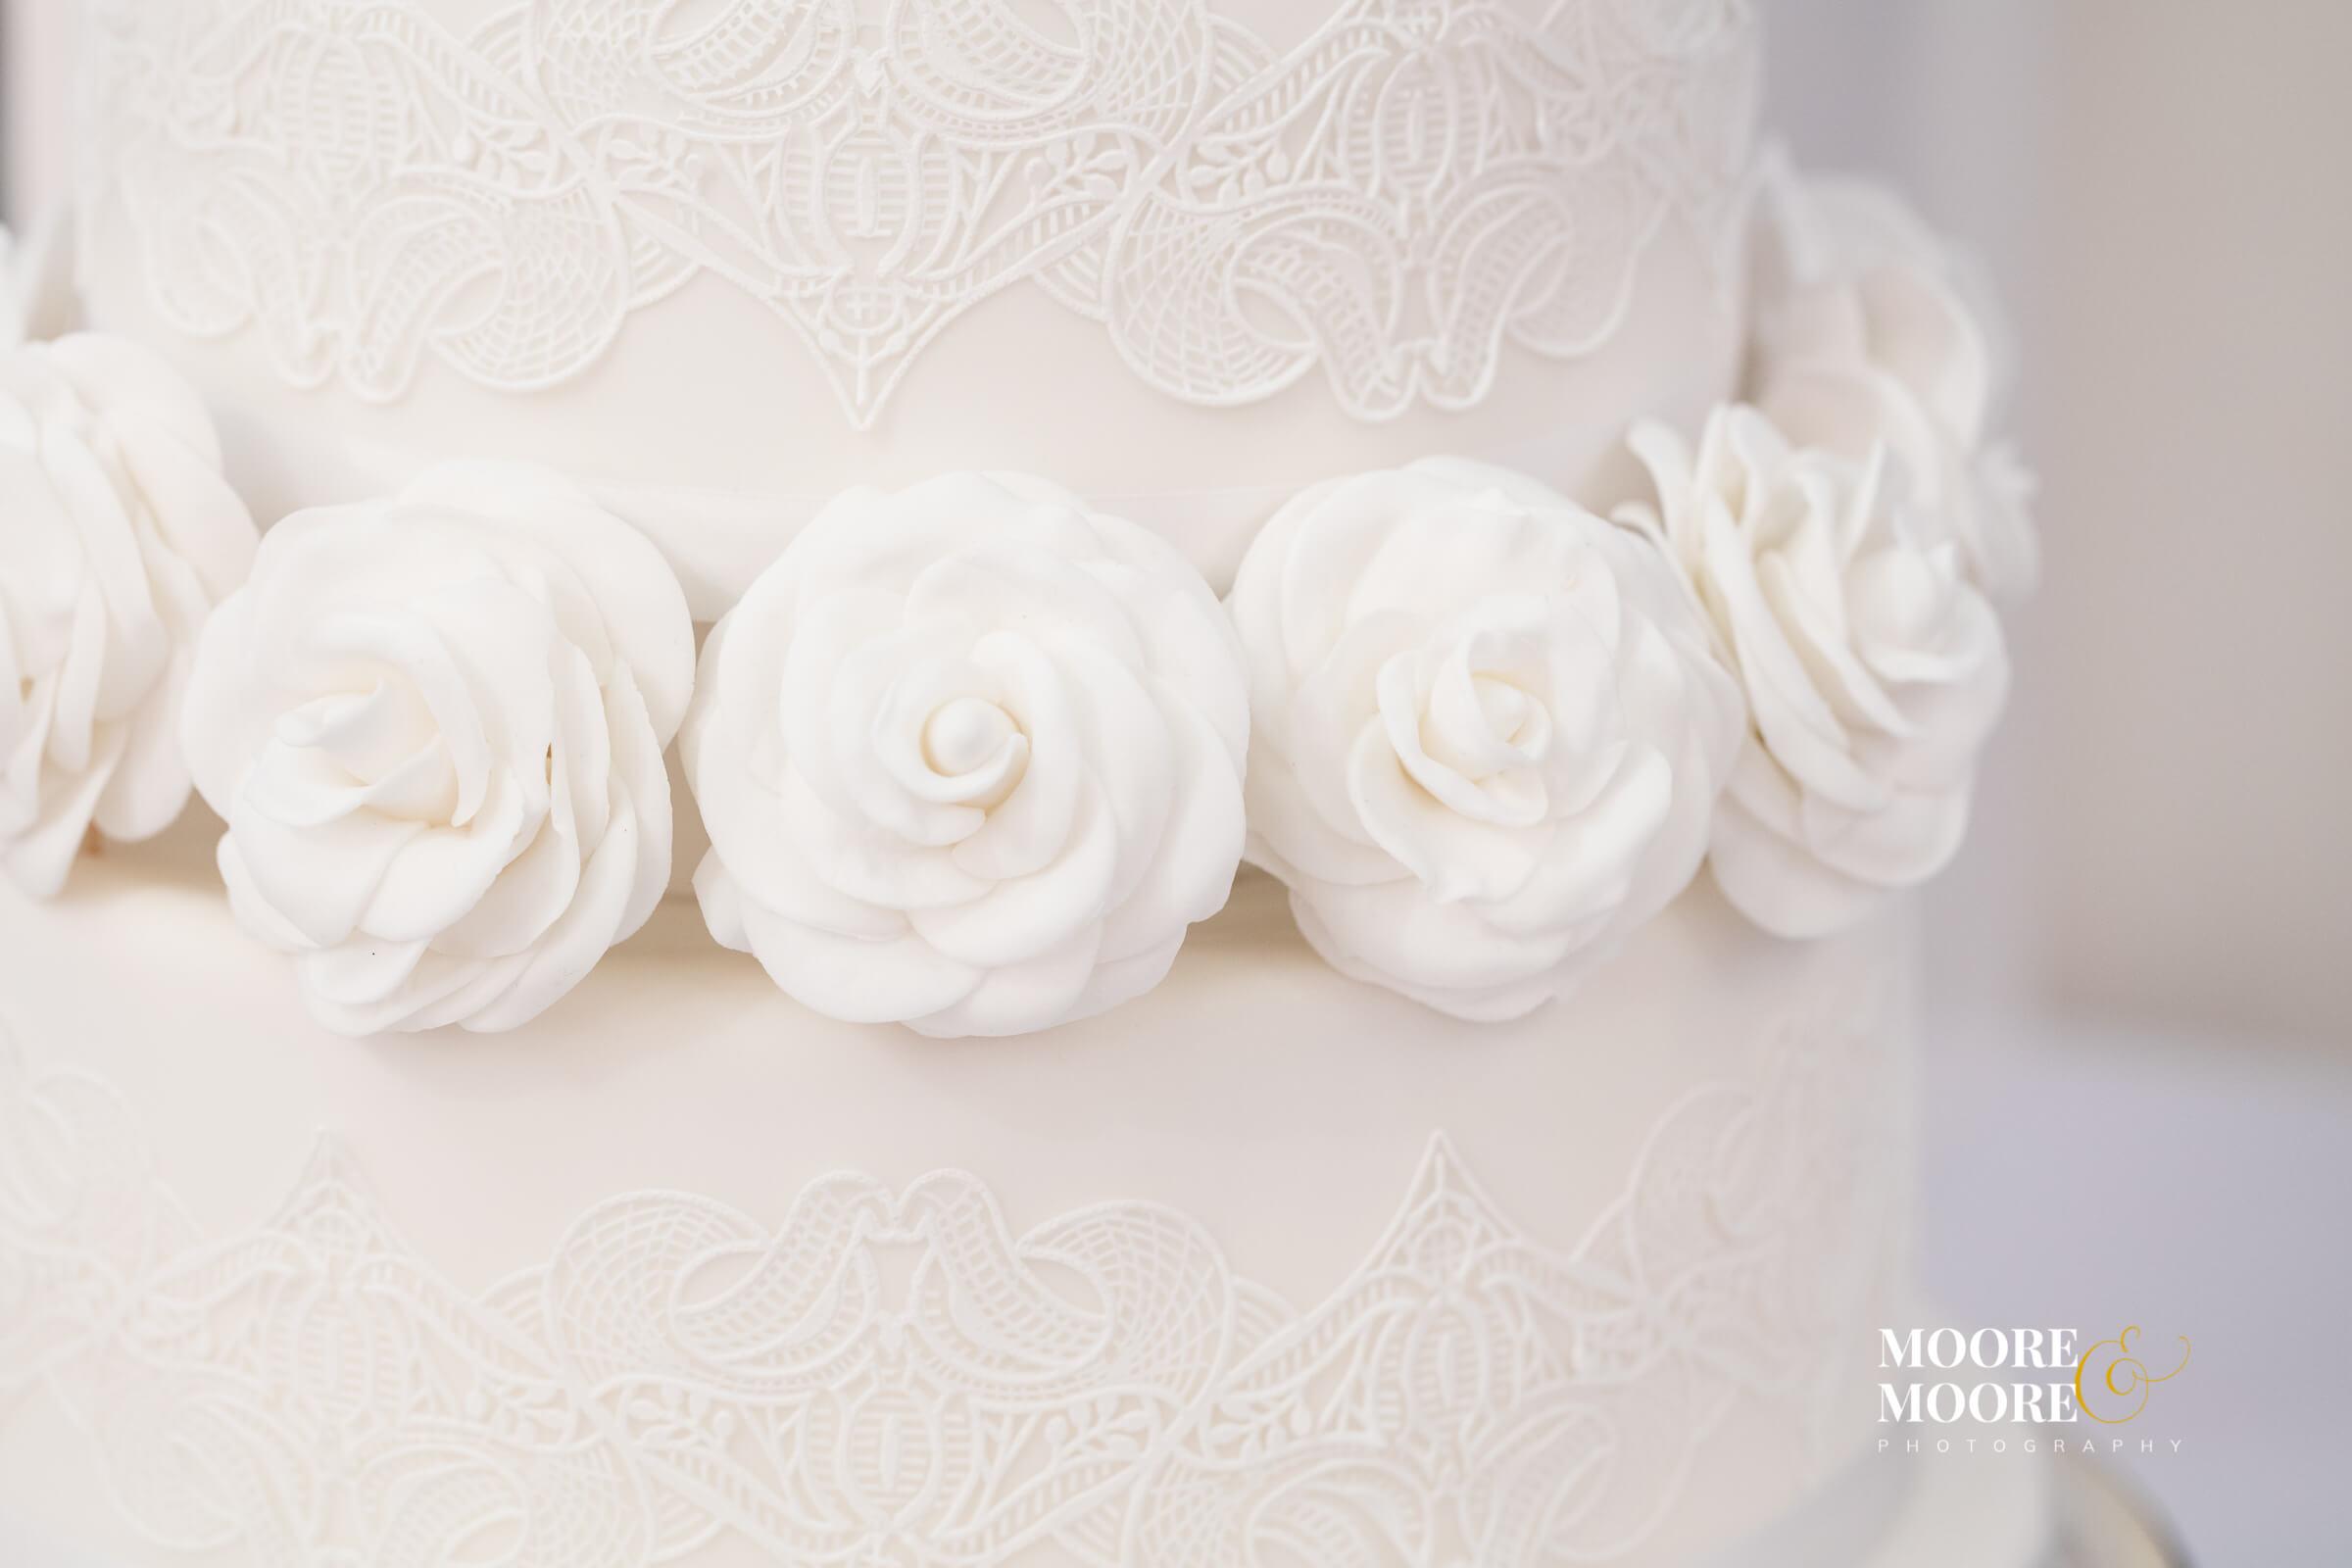 elegant wedding cake with white roses, wedding photos by Hampshire Wedding Photographer, Helen Moore of Moore&Moore Photography